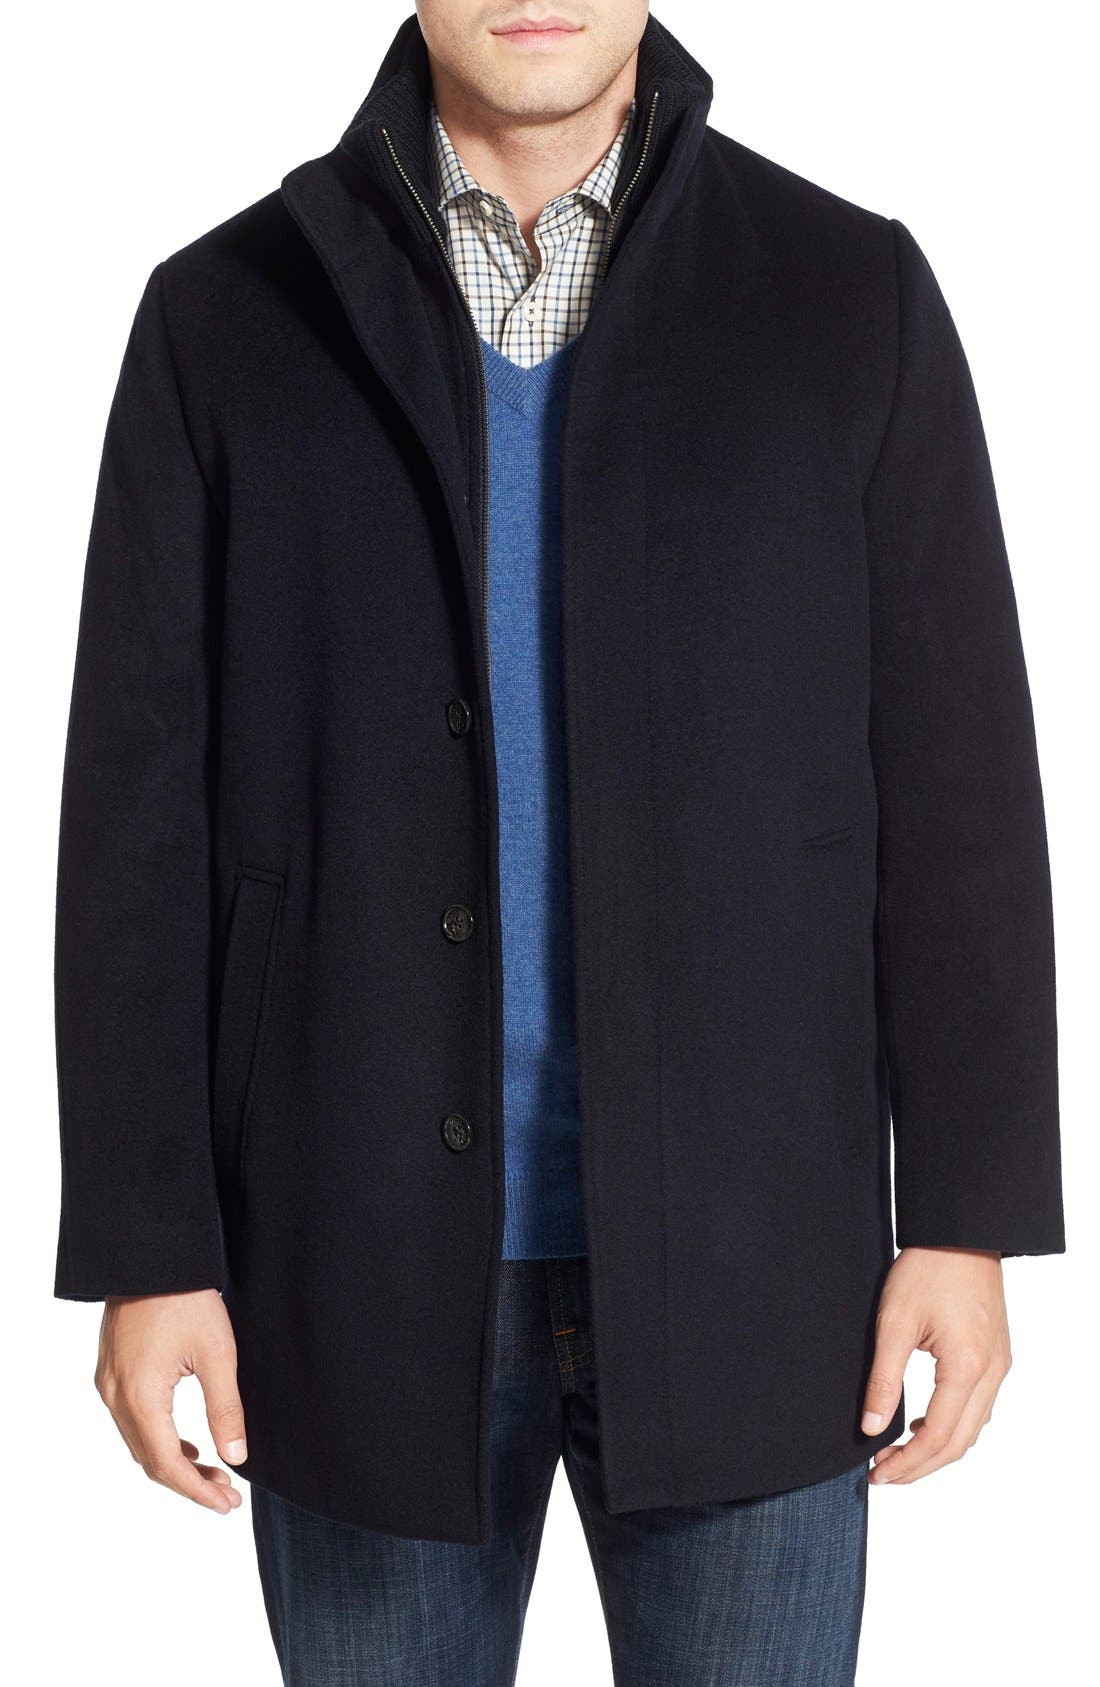 Main Image - Cardinal of Canada Wool Jacket